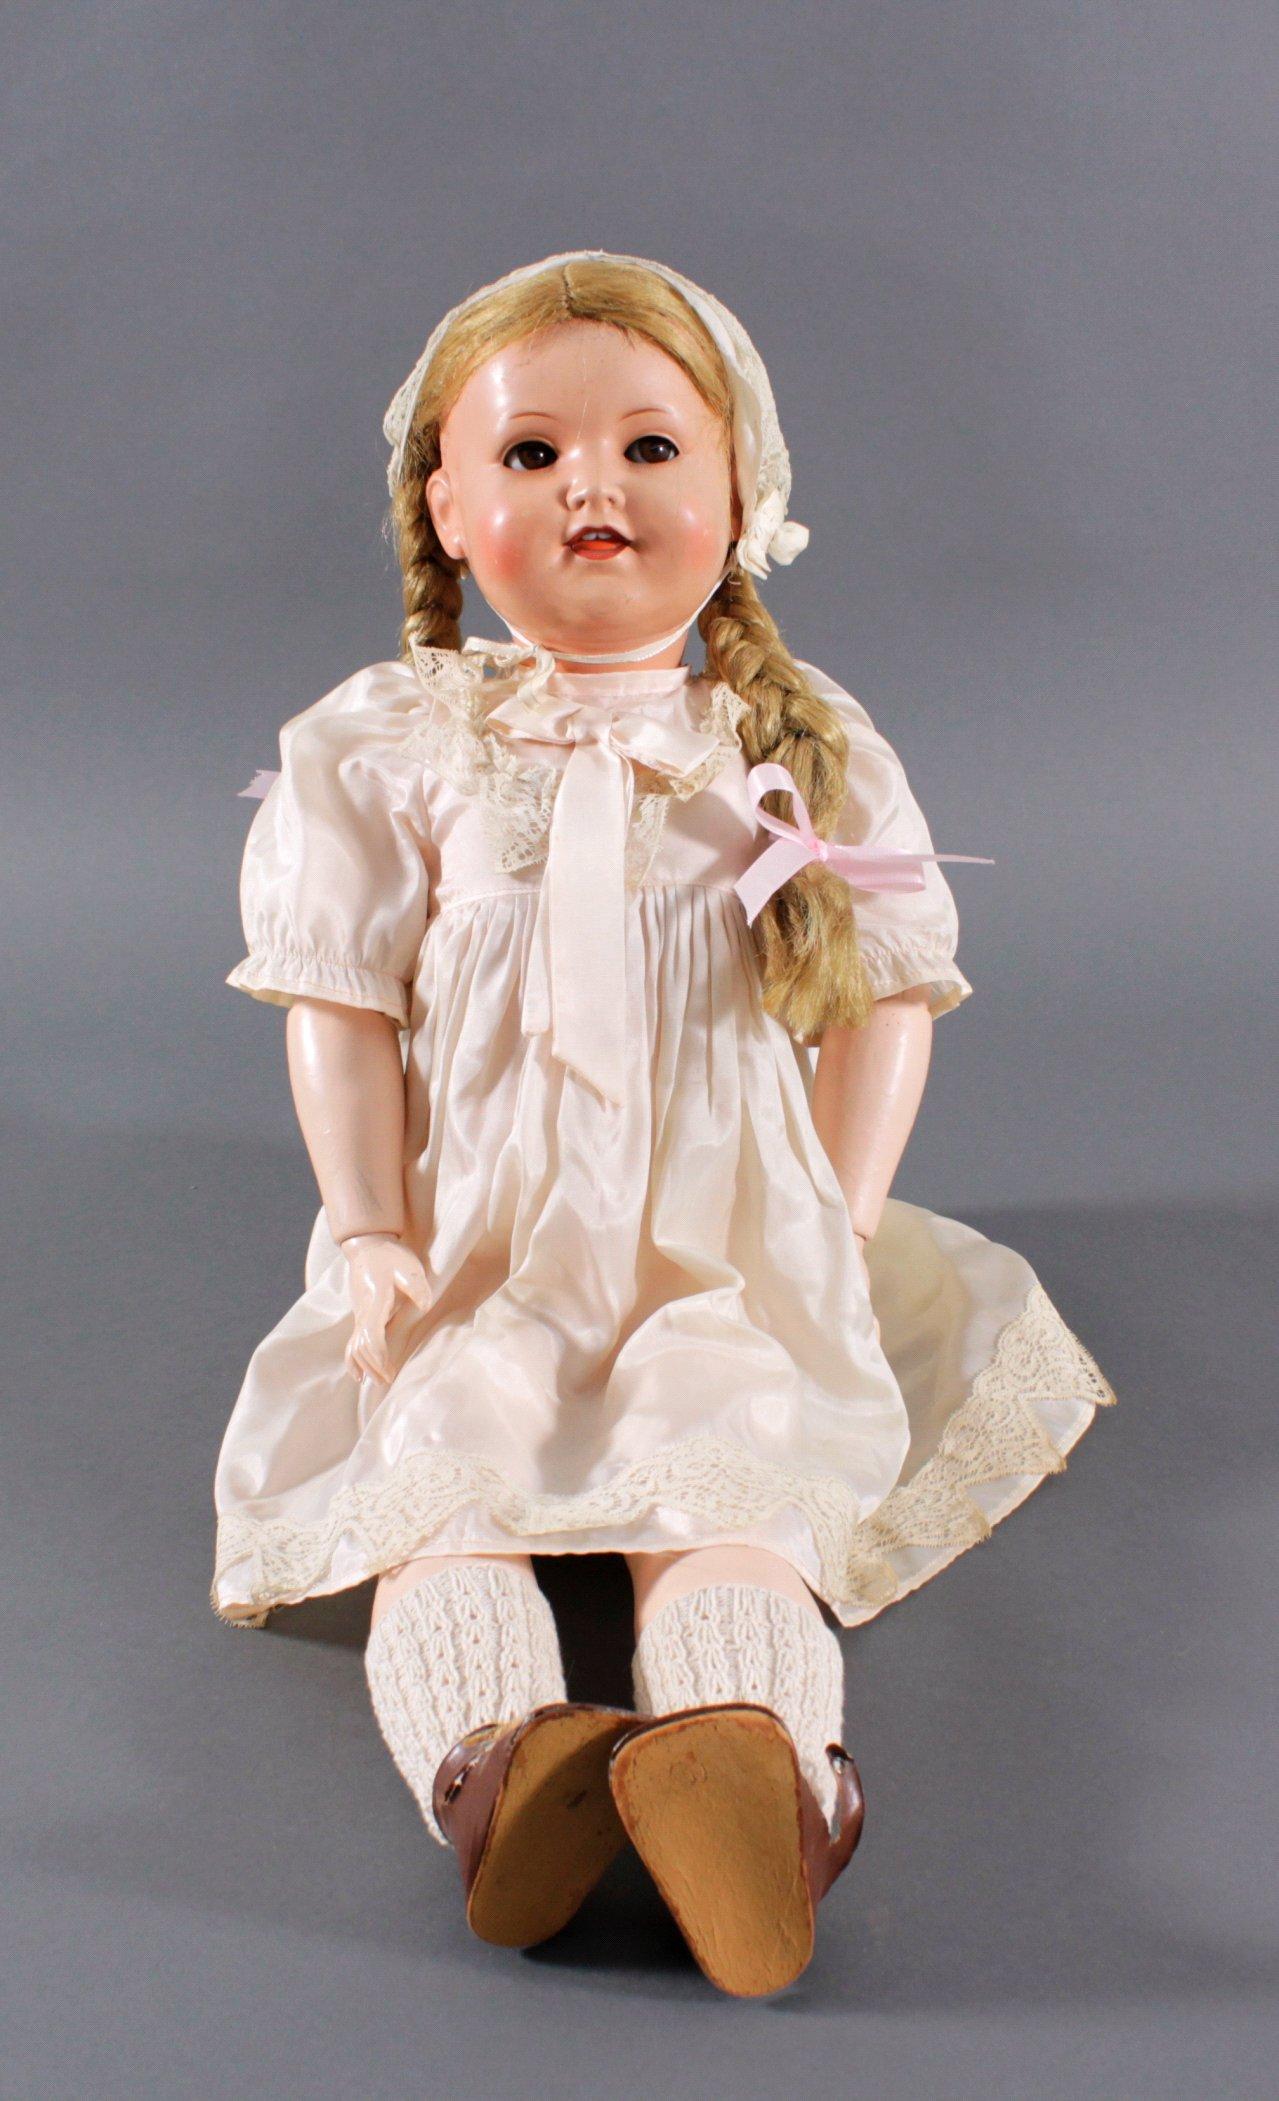 König & Wernicke Puppe